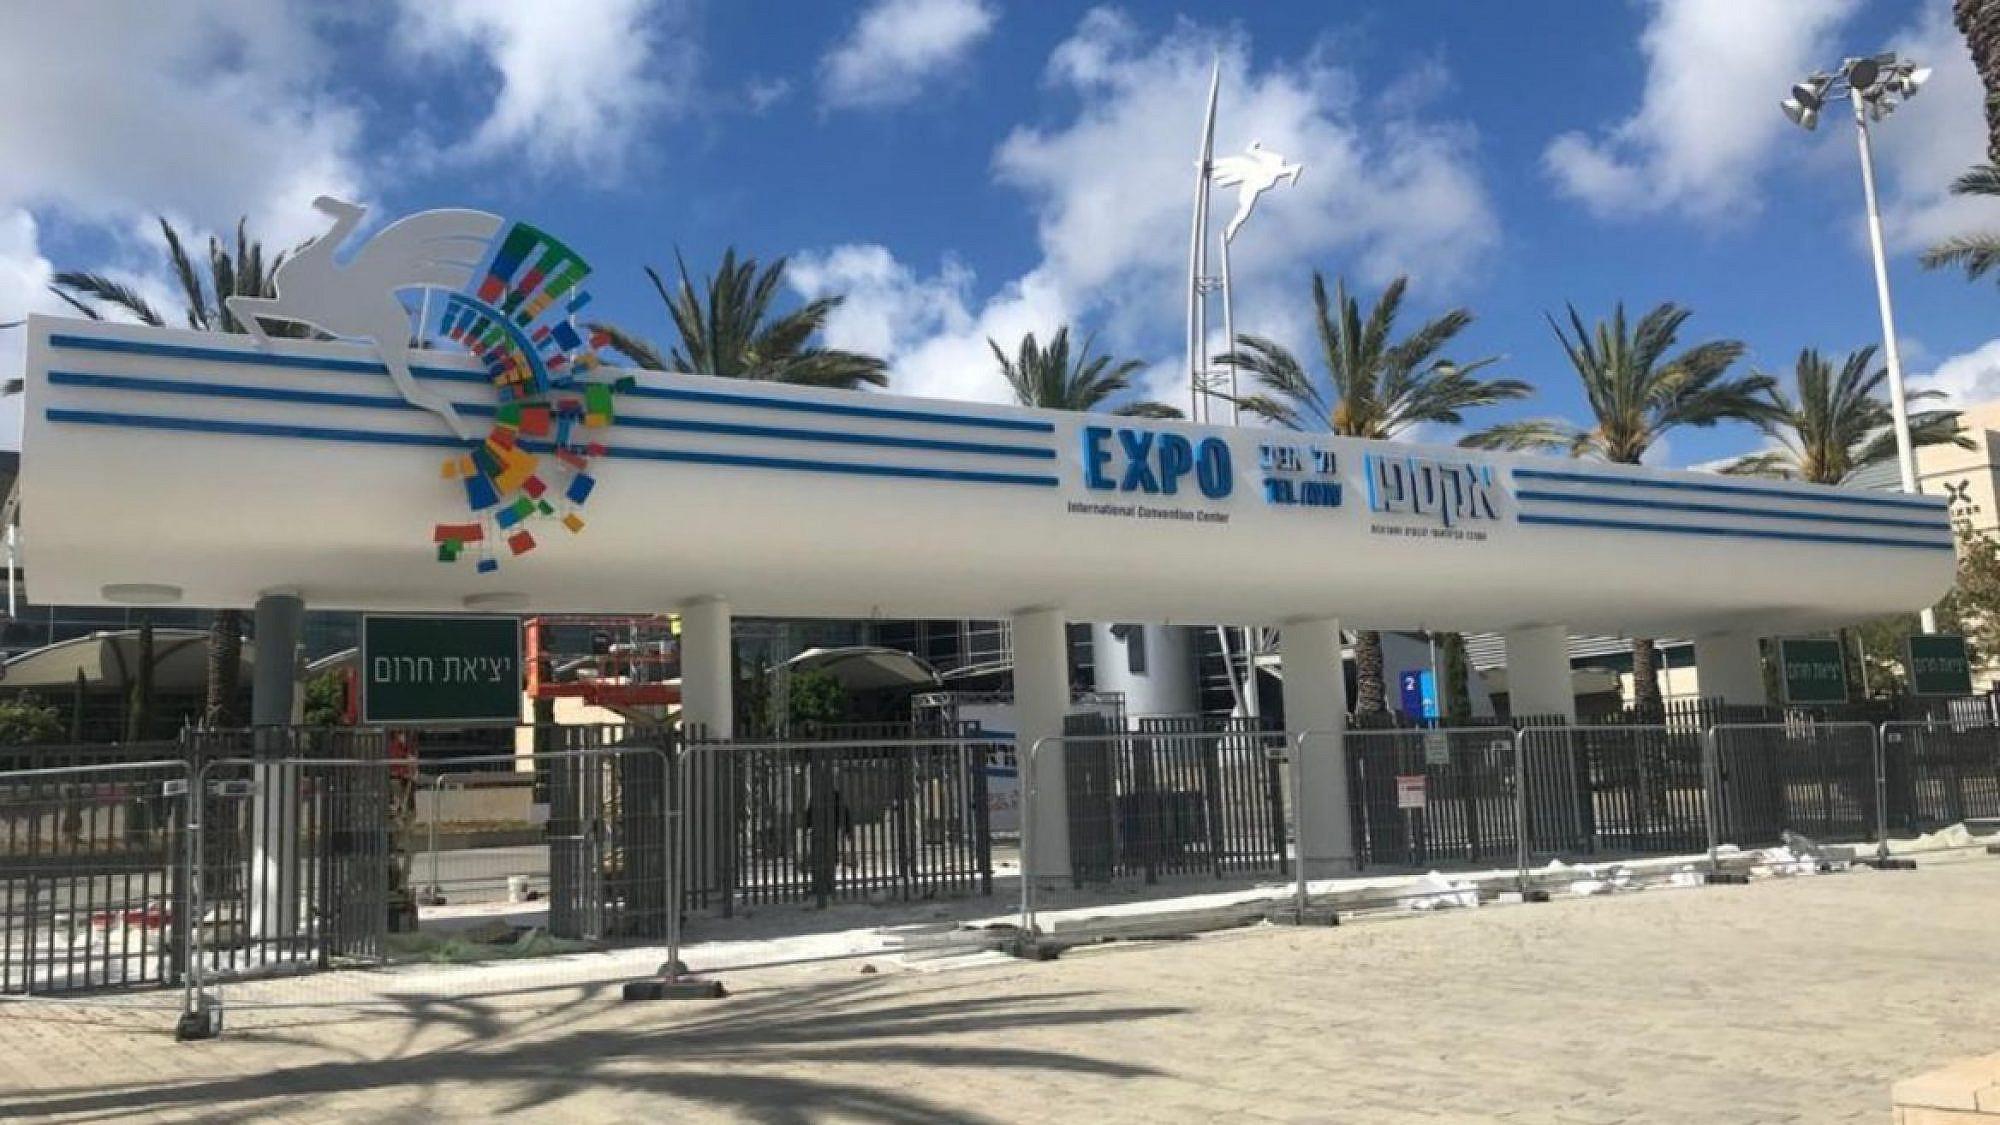 How Tel Aviv's Levant Fair came to host Eurovision   JNS org